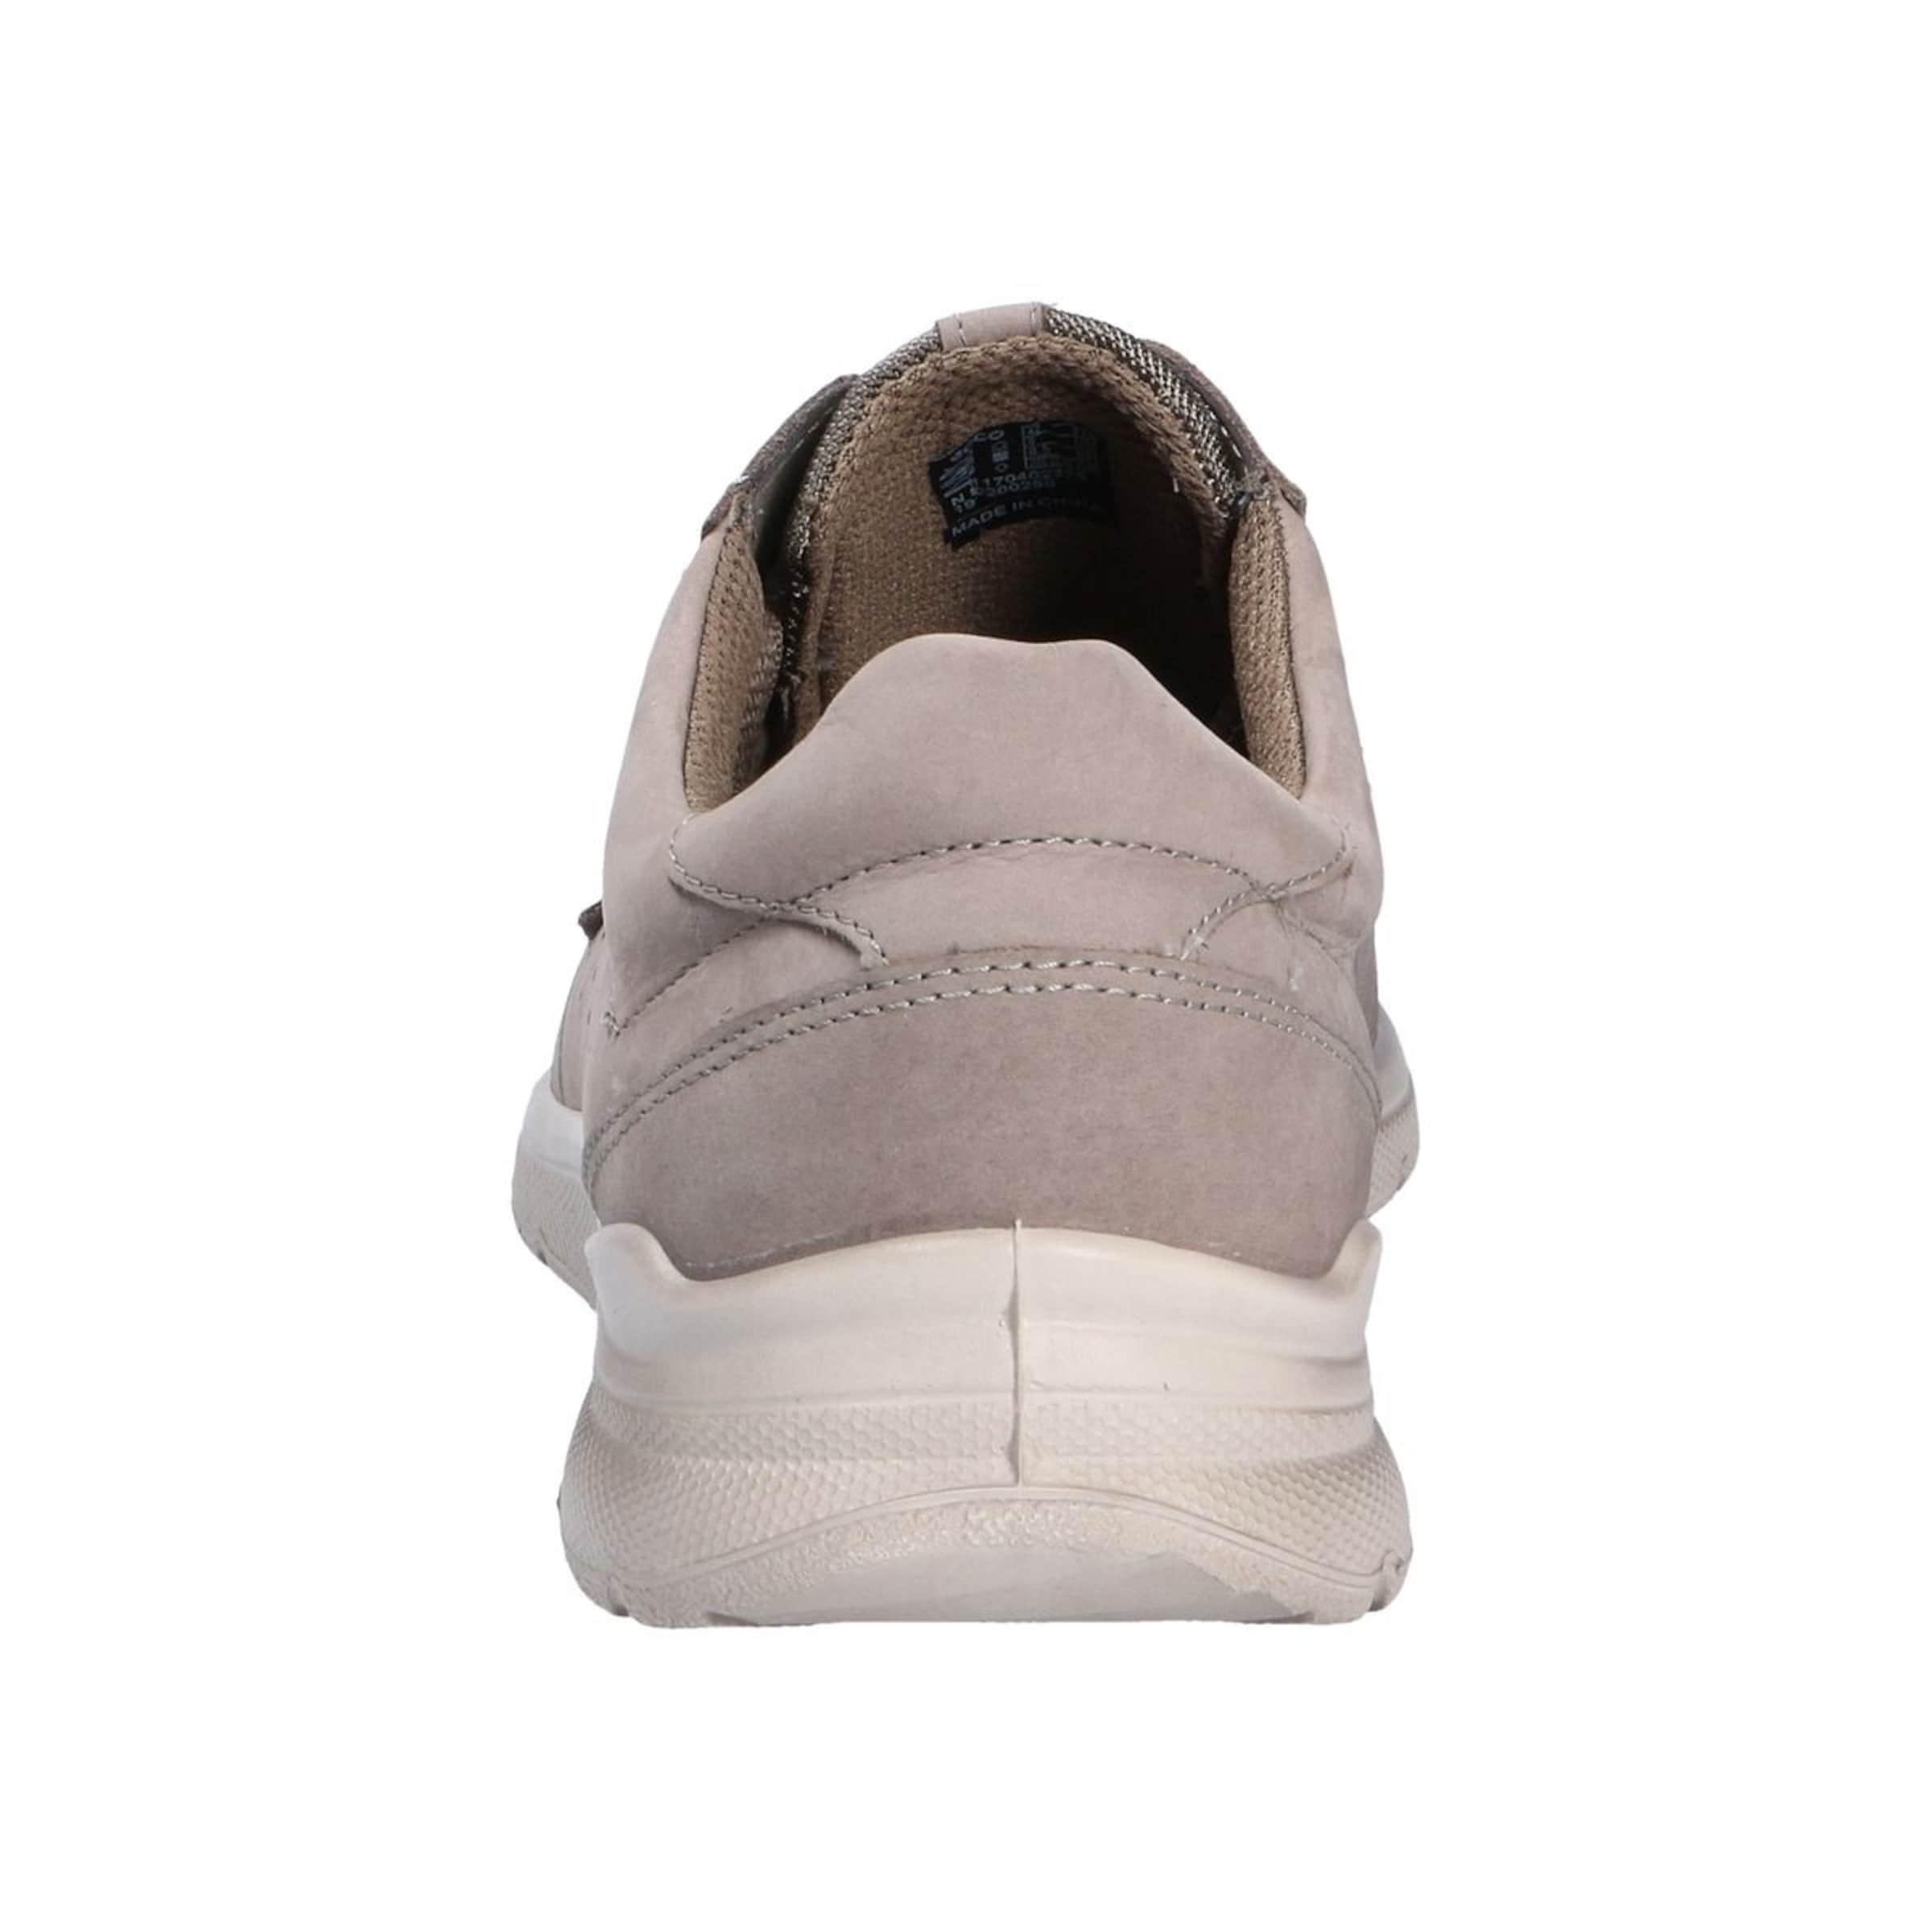 Sneaker Sneaker In Ecco Taupe In Ecco Taupe zLVqSUMpG